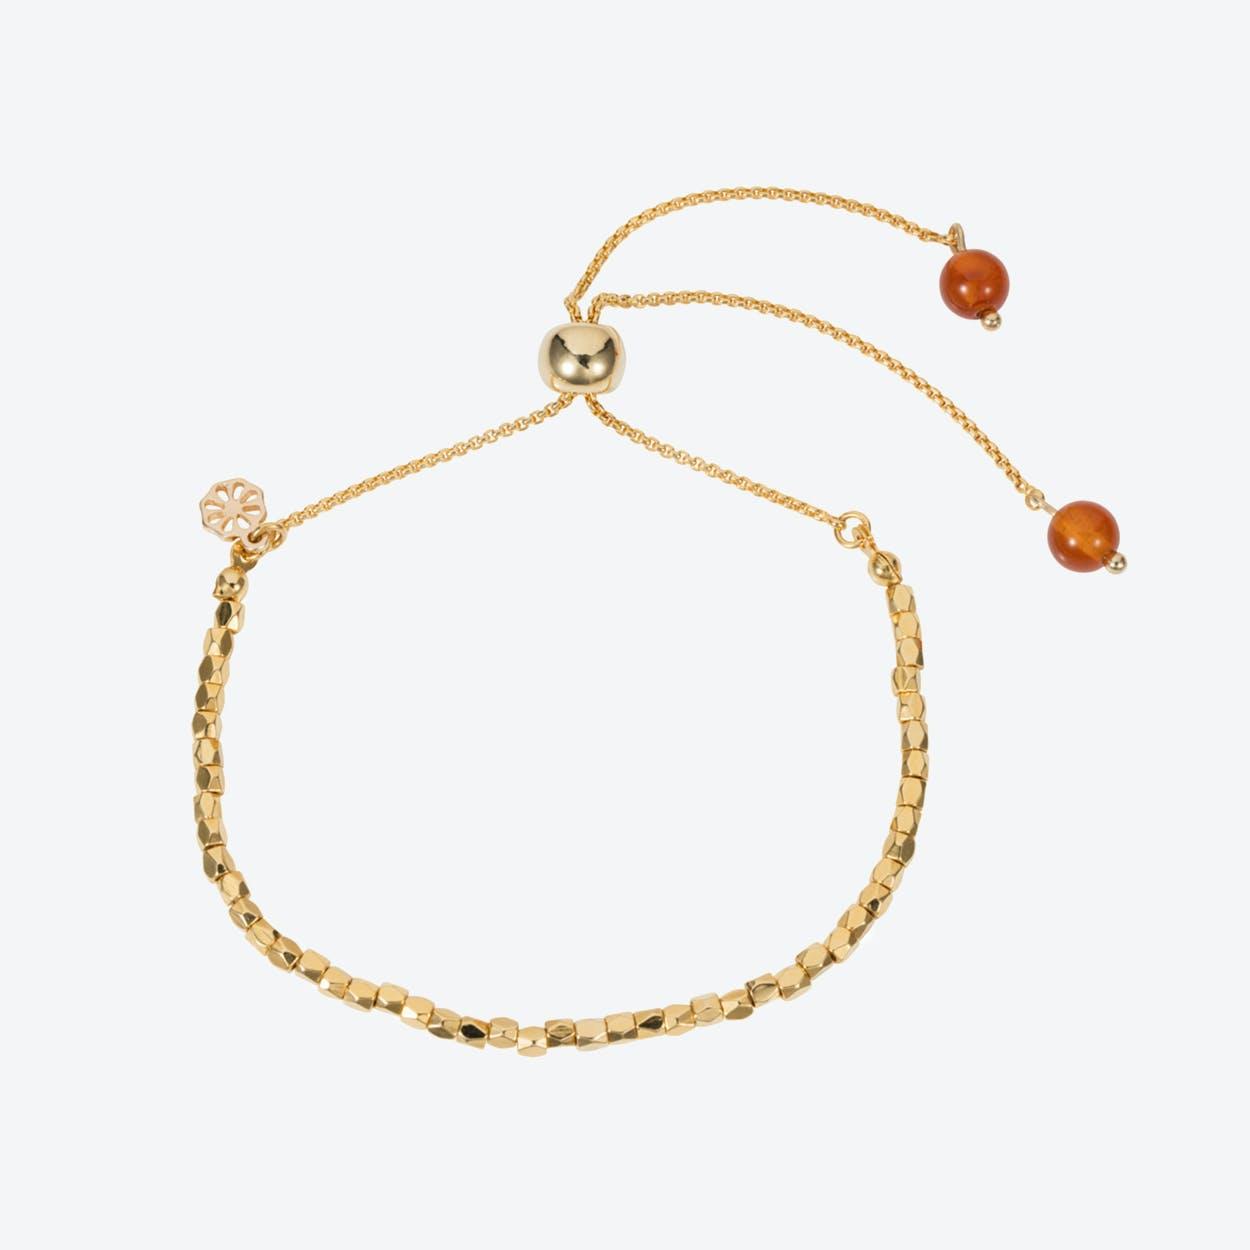 Friendship Bracelet – Gold with Orange Agate